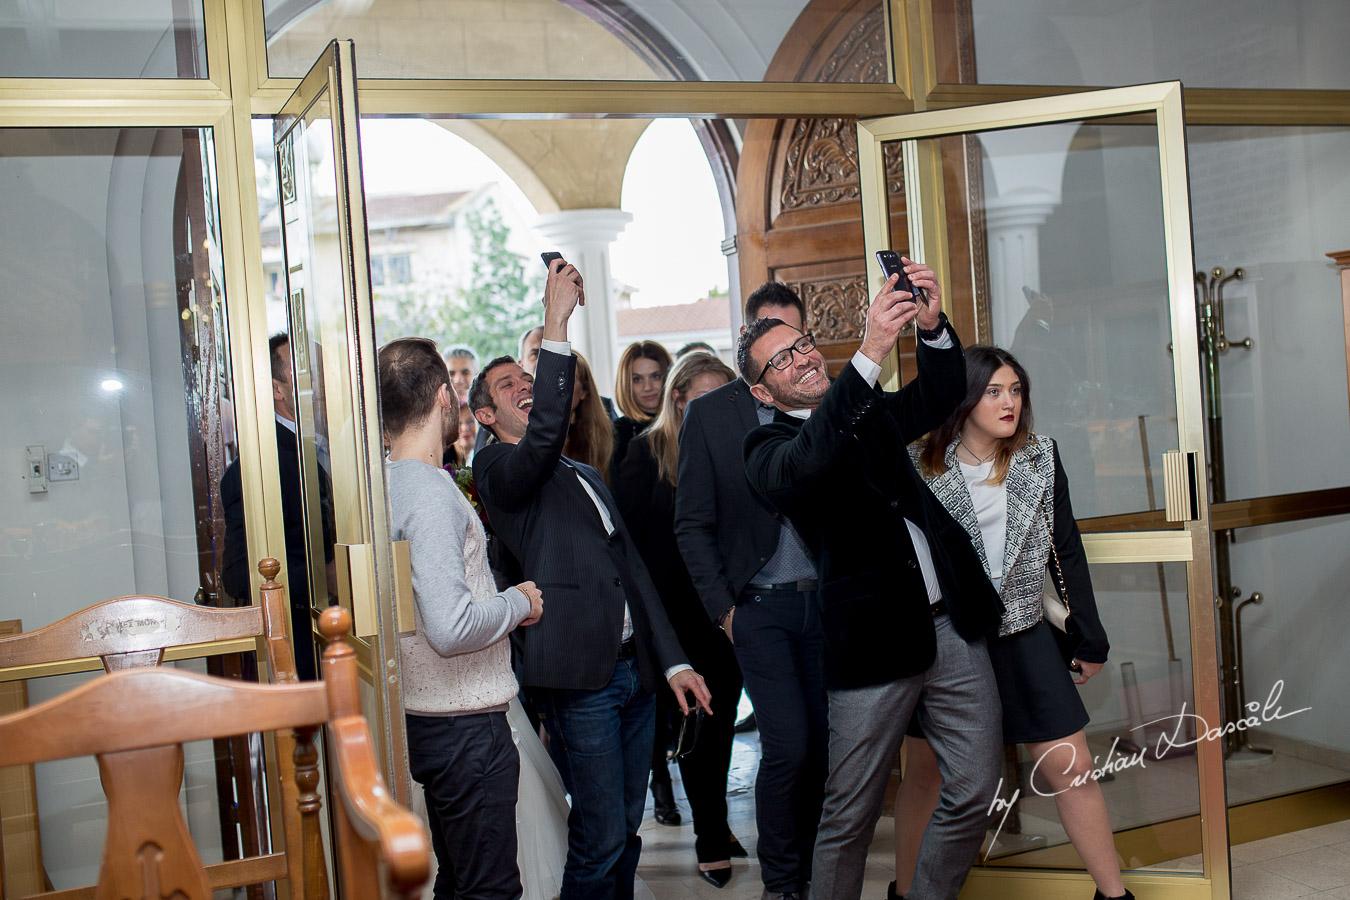 Wedding of Costas & Maria - Nicosia, Agios Dometios 25